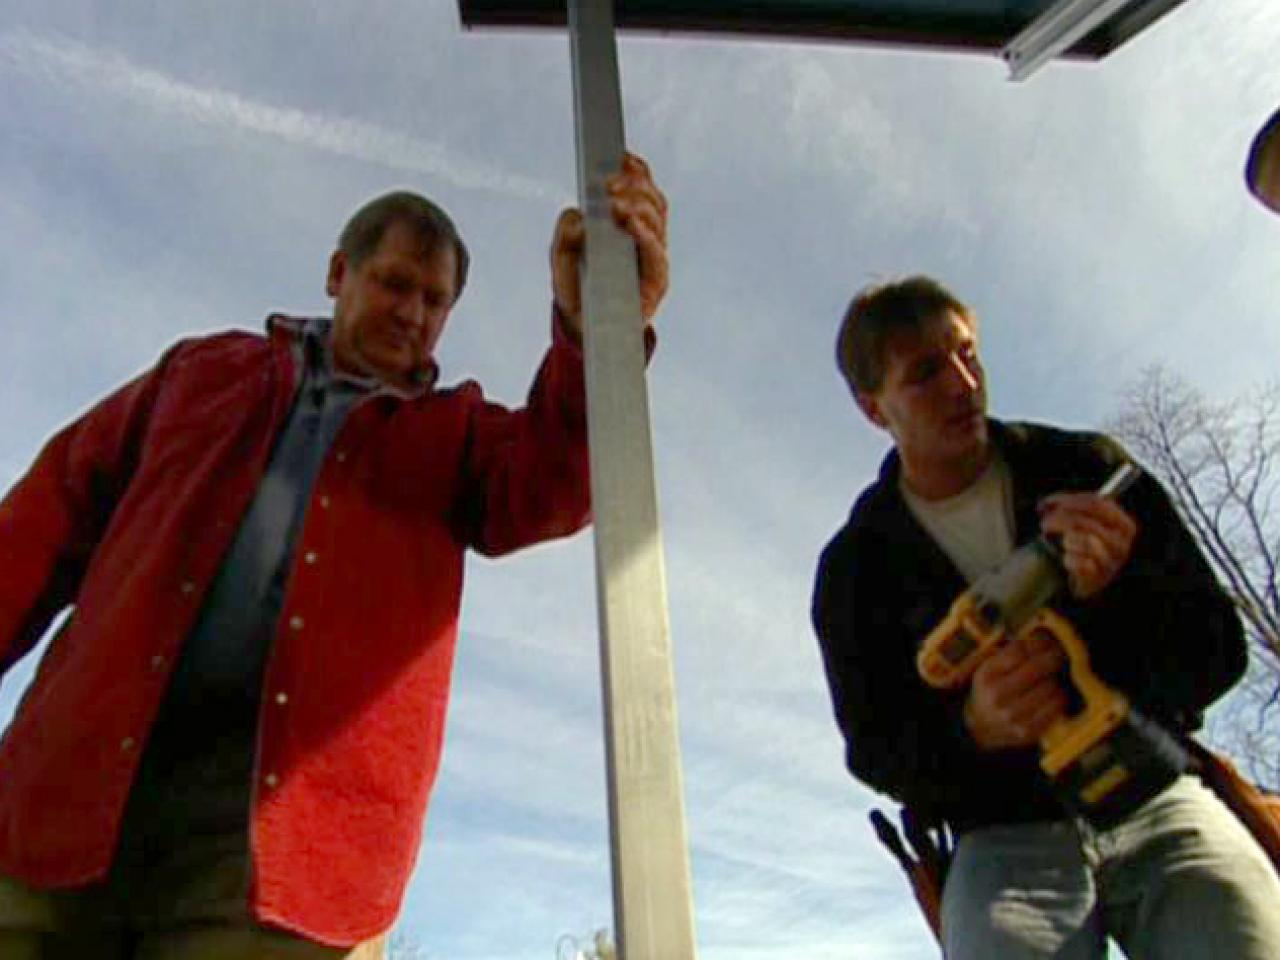 How to Install an Exterior Solar Panel | how-tos | DIY